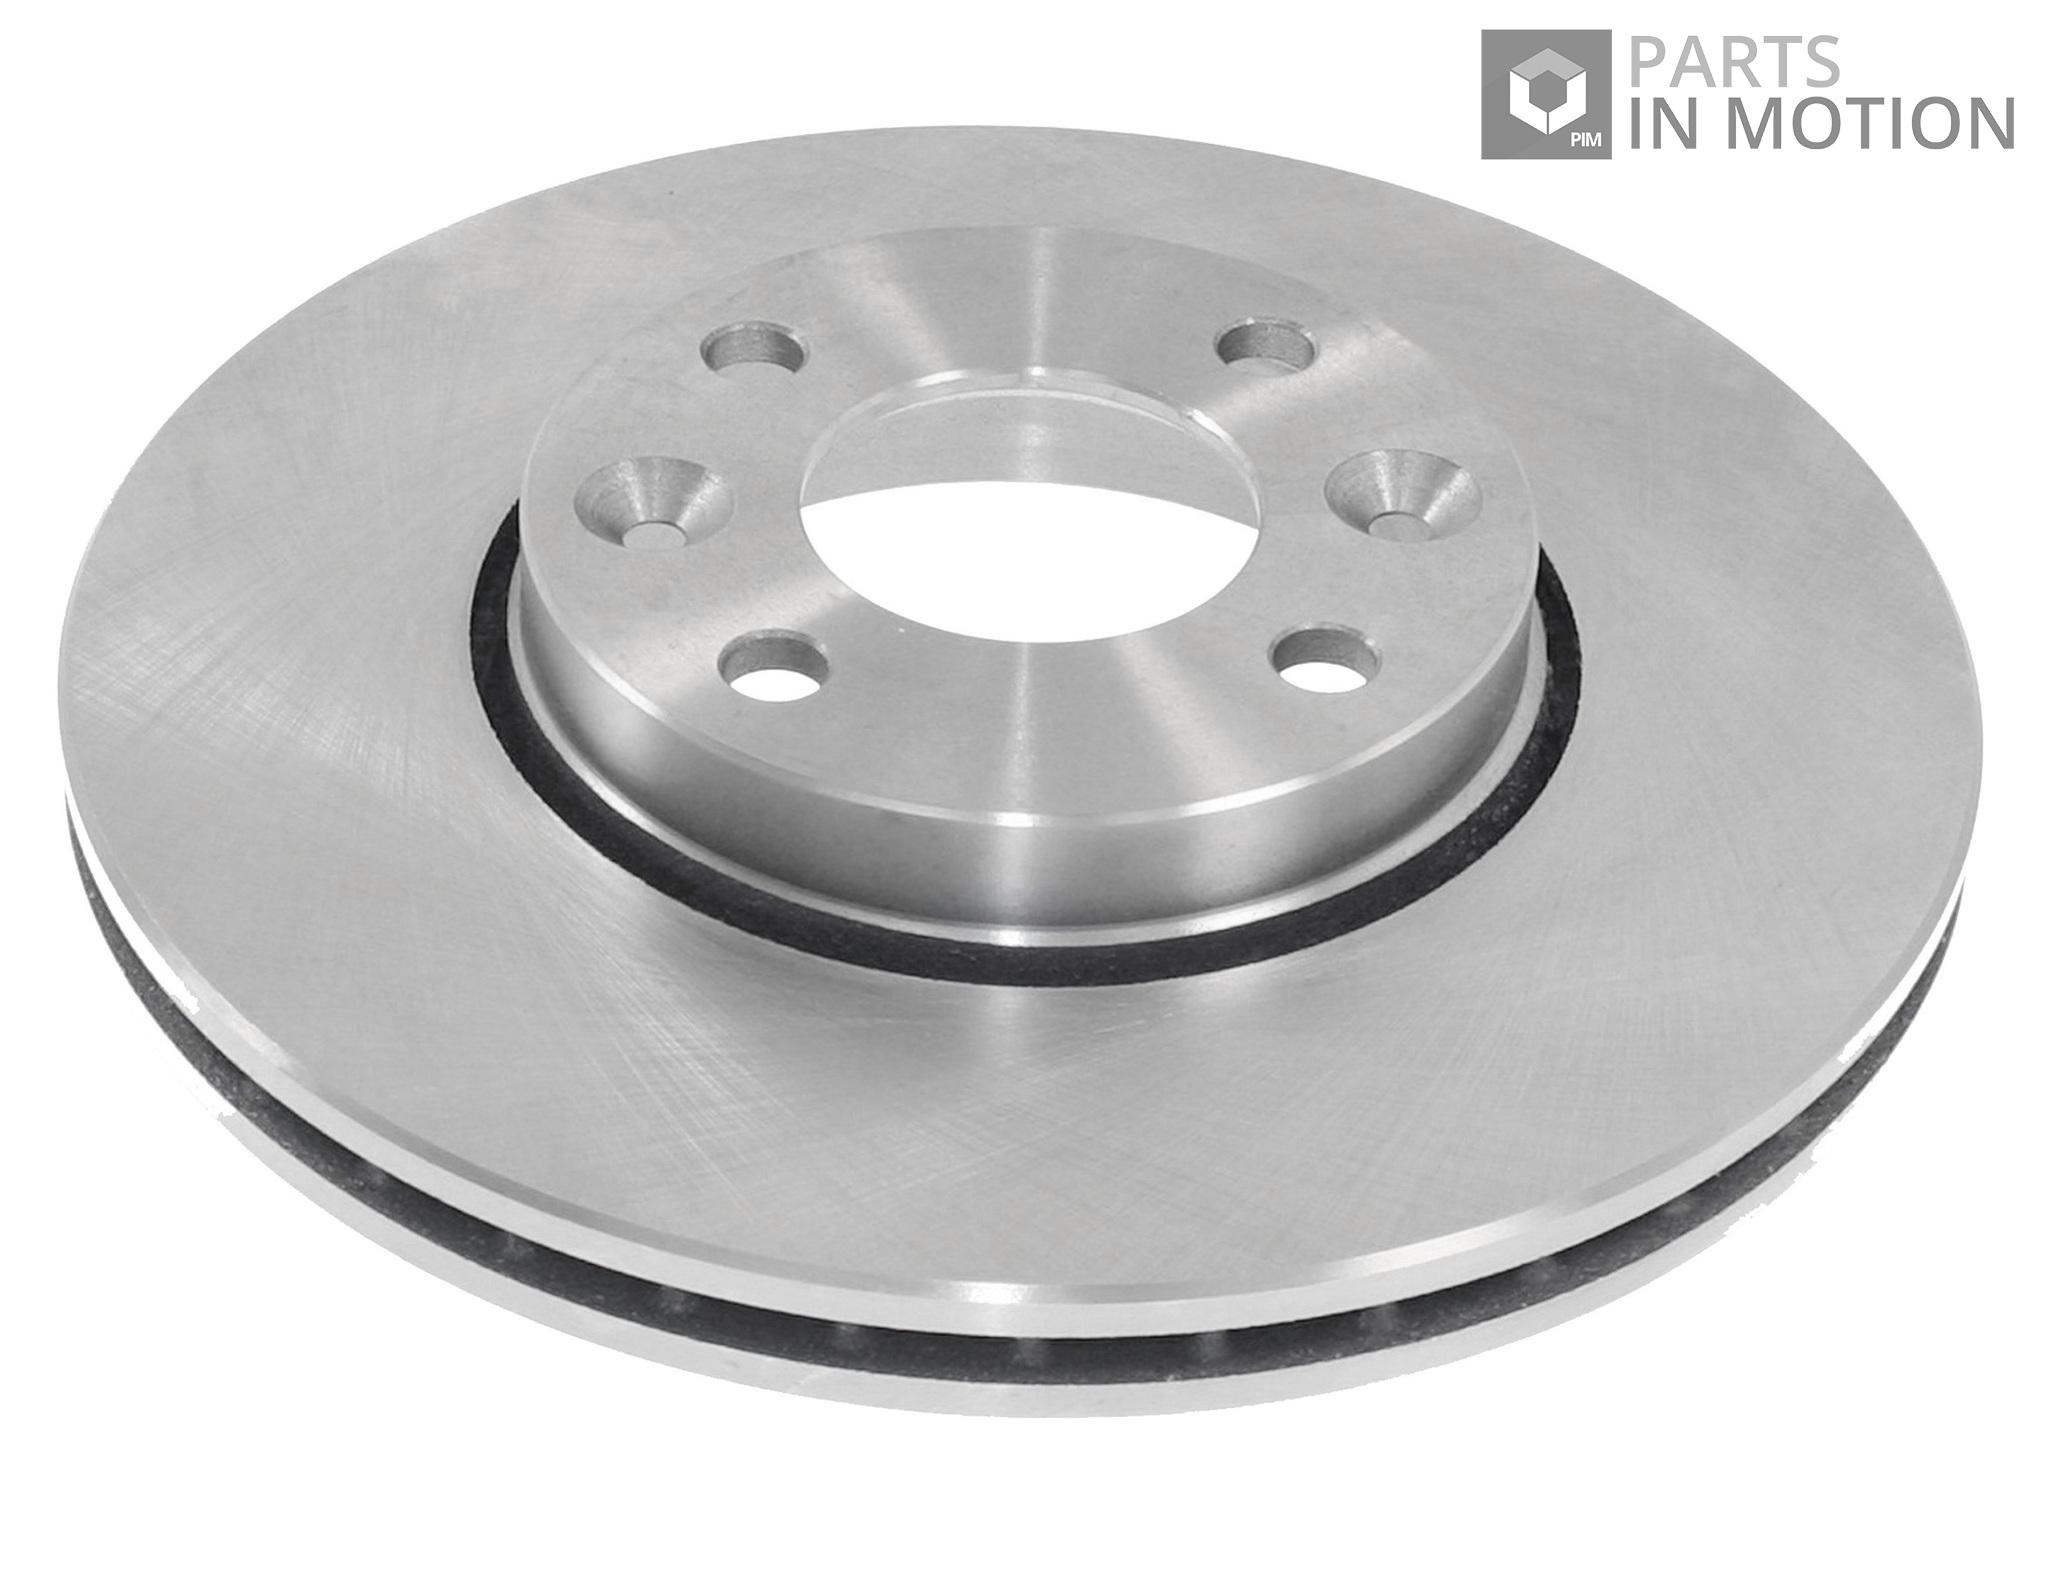 Fits Nissan Pixo 1.0 Front Brake Discs /& Pads Braking Set 2009 Vented 4 Stud